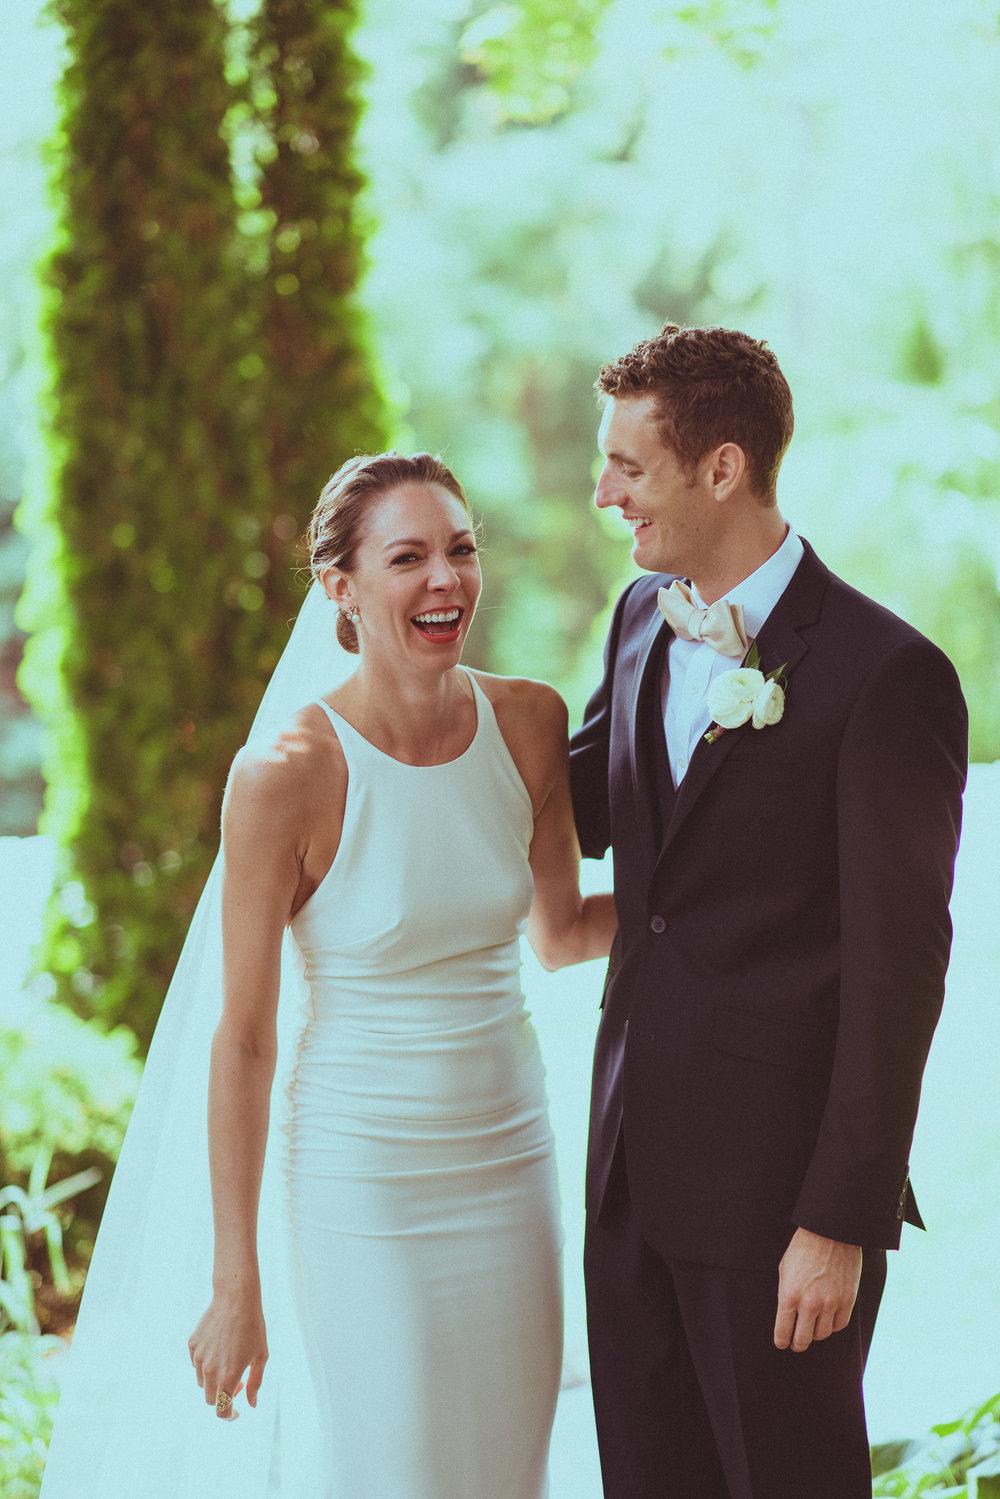 BEST_CHICAG_WEDDING_PHOTOGRAPHER_ZOE_RAIN_-35.jpg